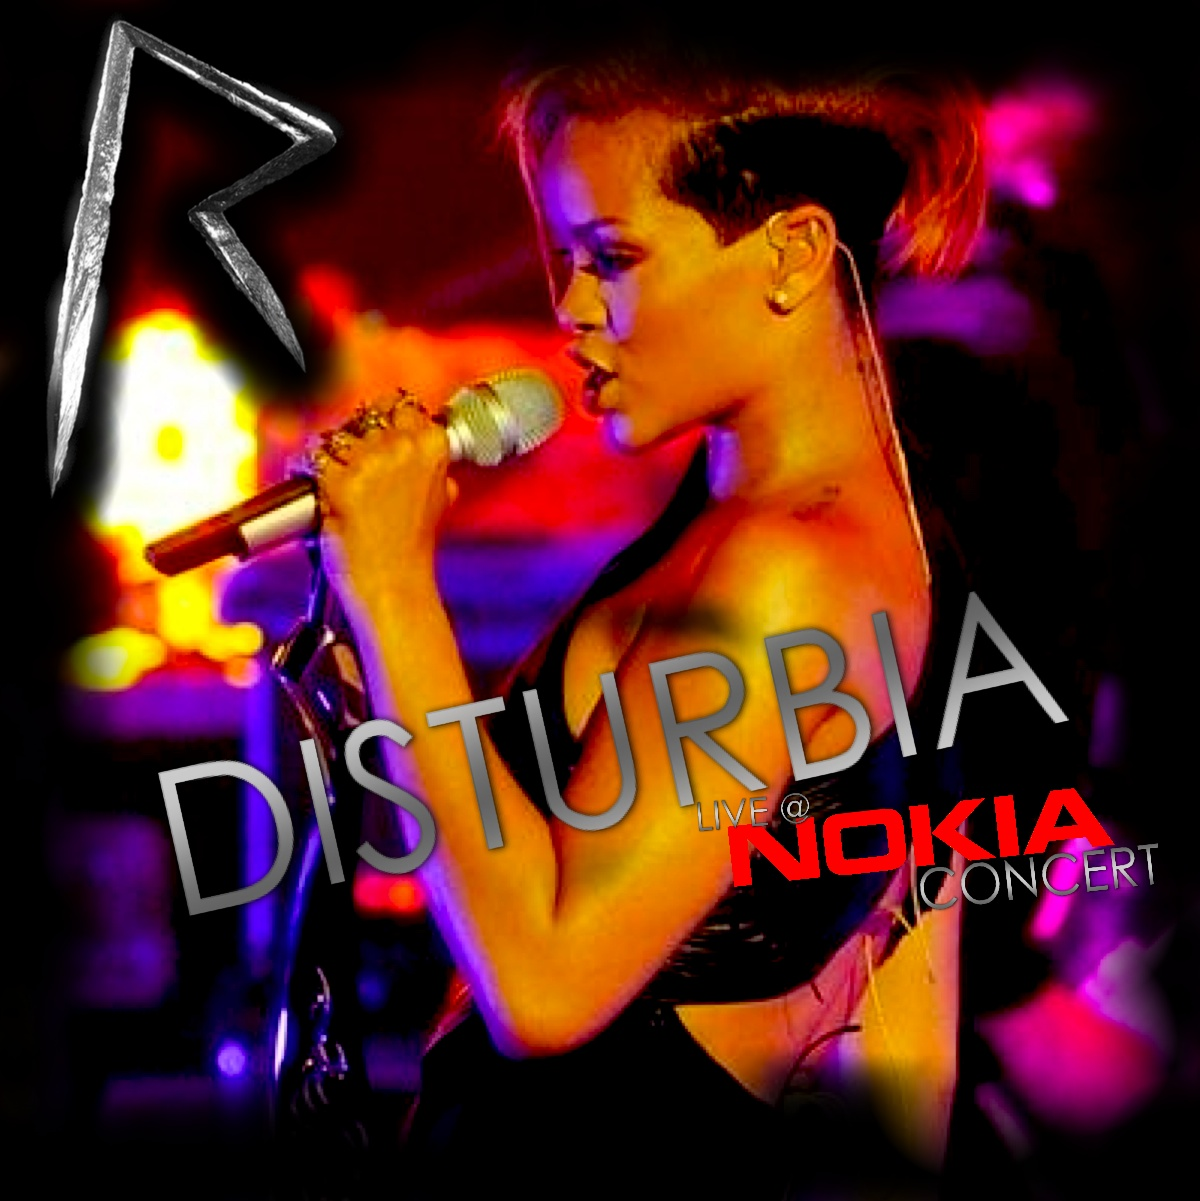 Disturbia Rihanna Cover Rihanna Disturbia Cover Art